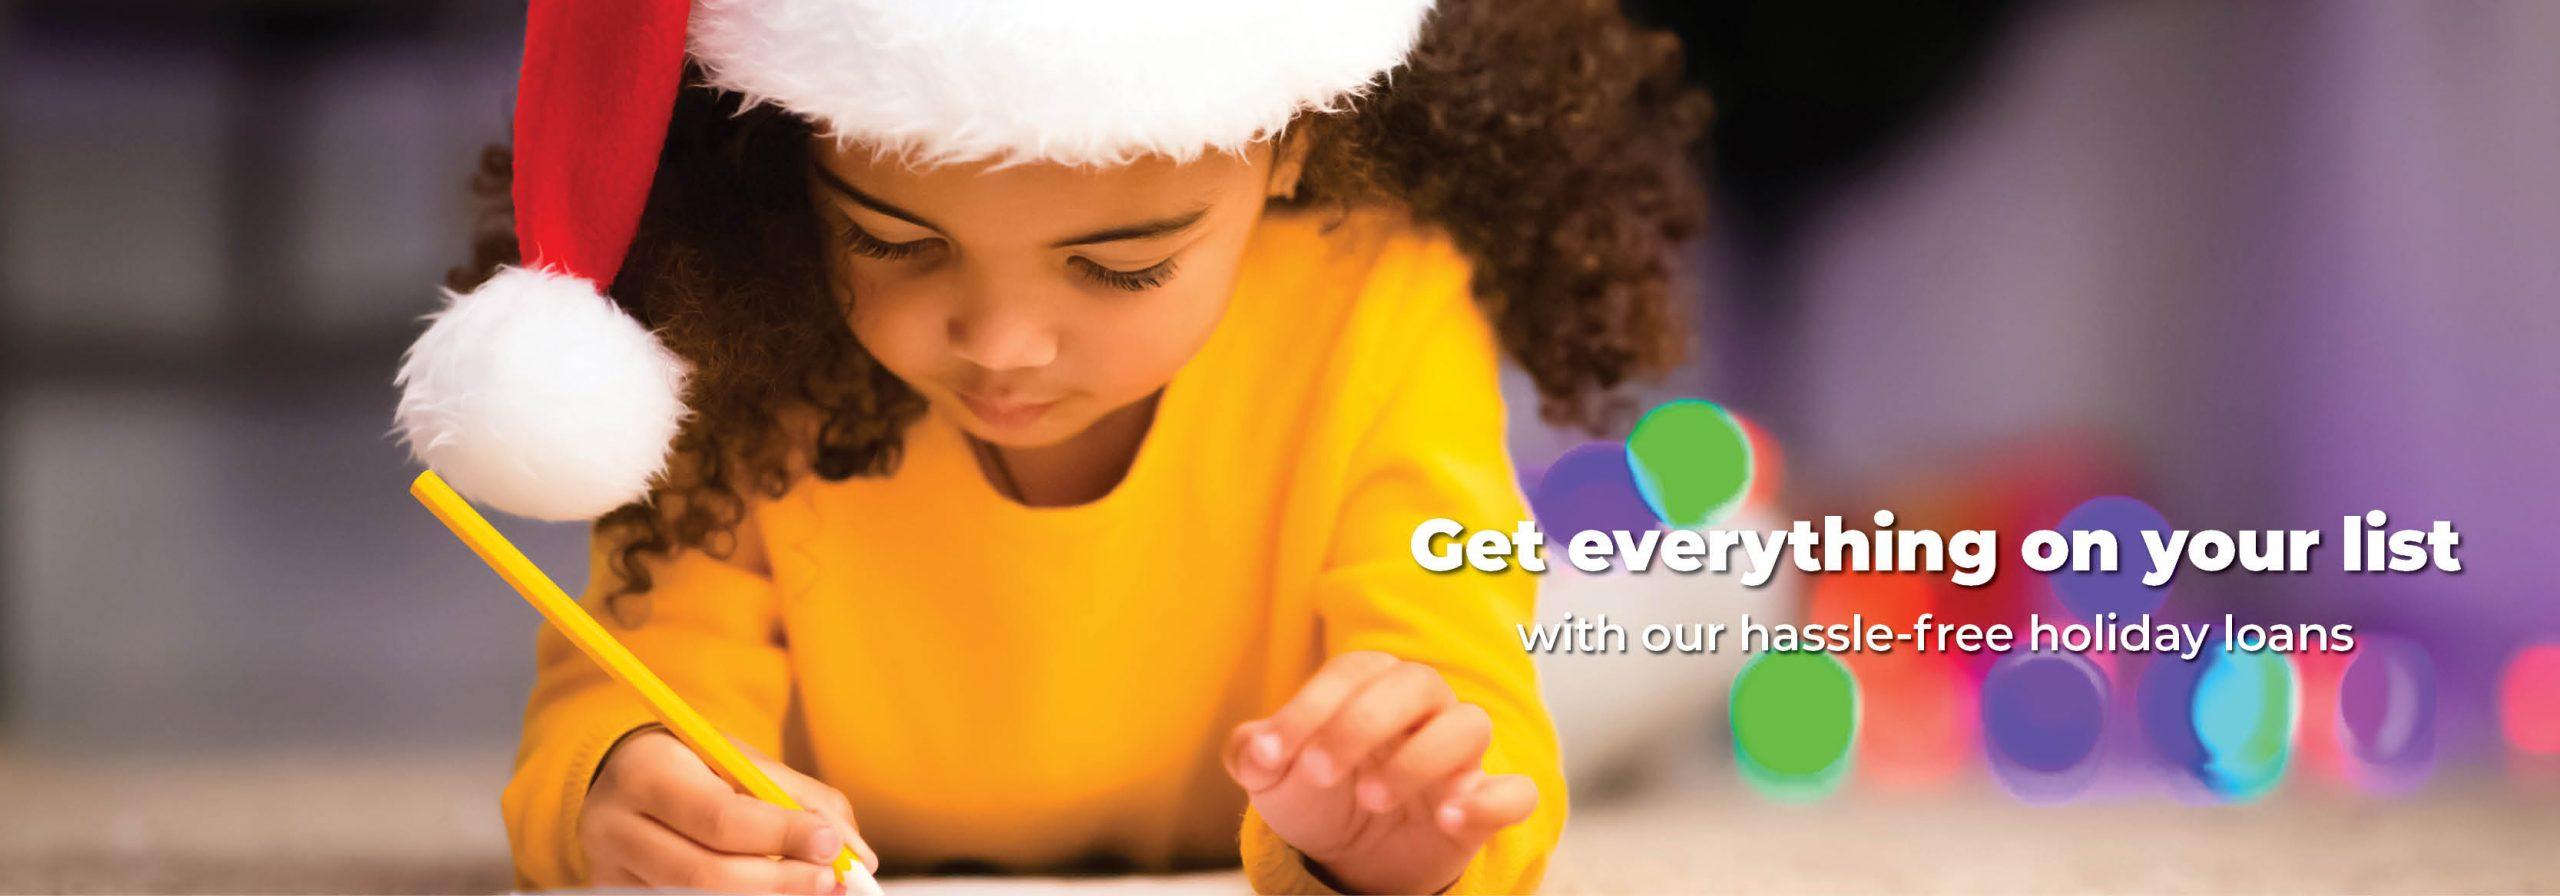 Holiday Loans 2021 image slide